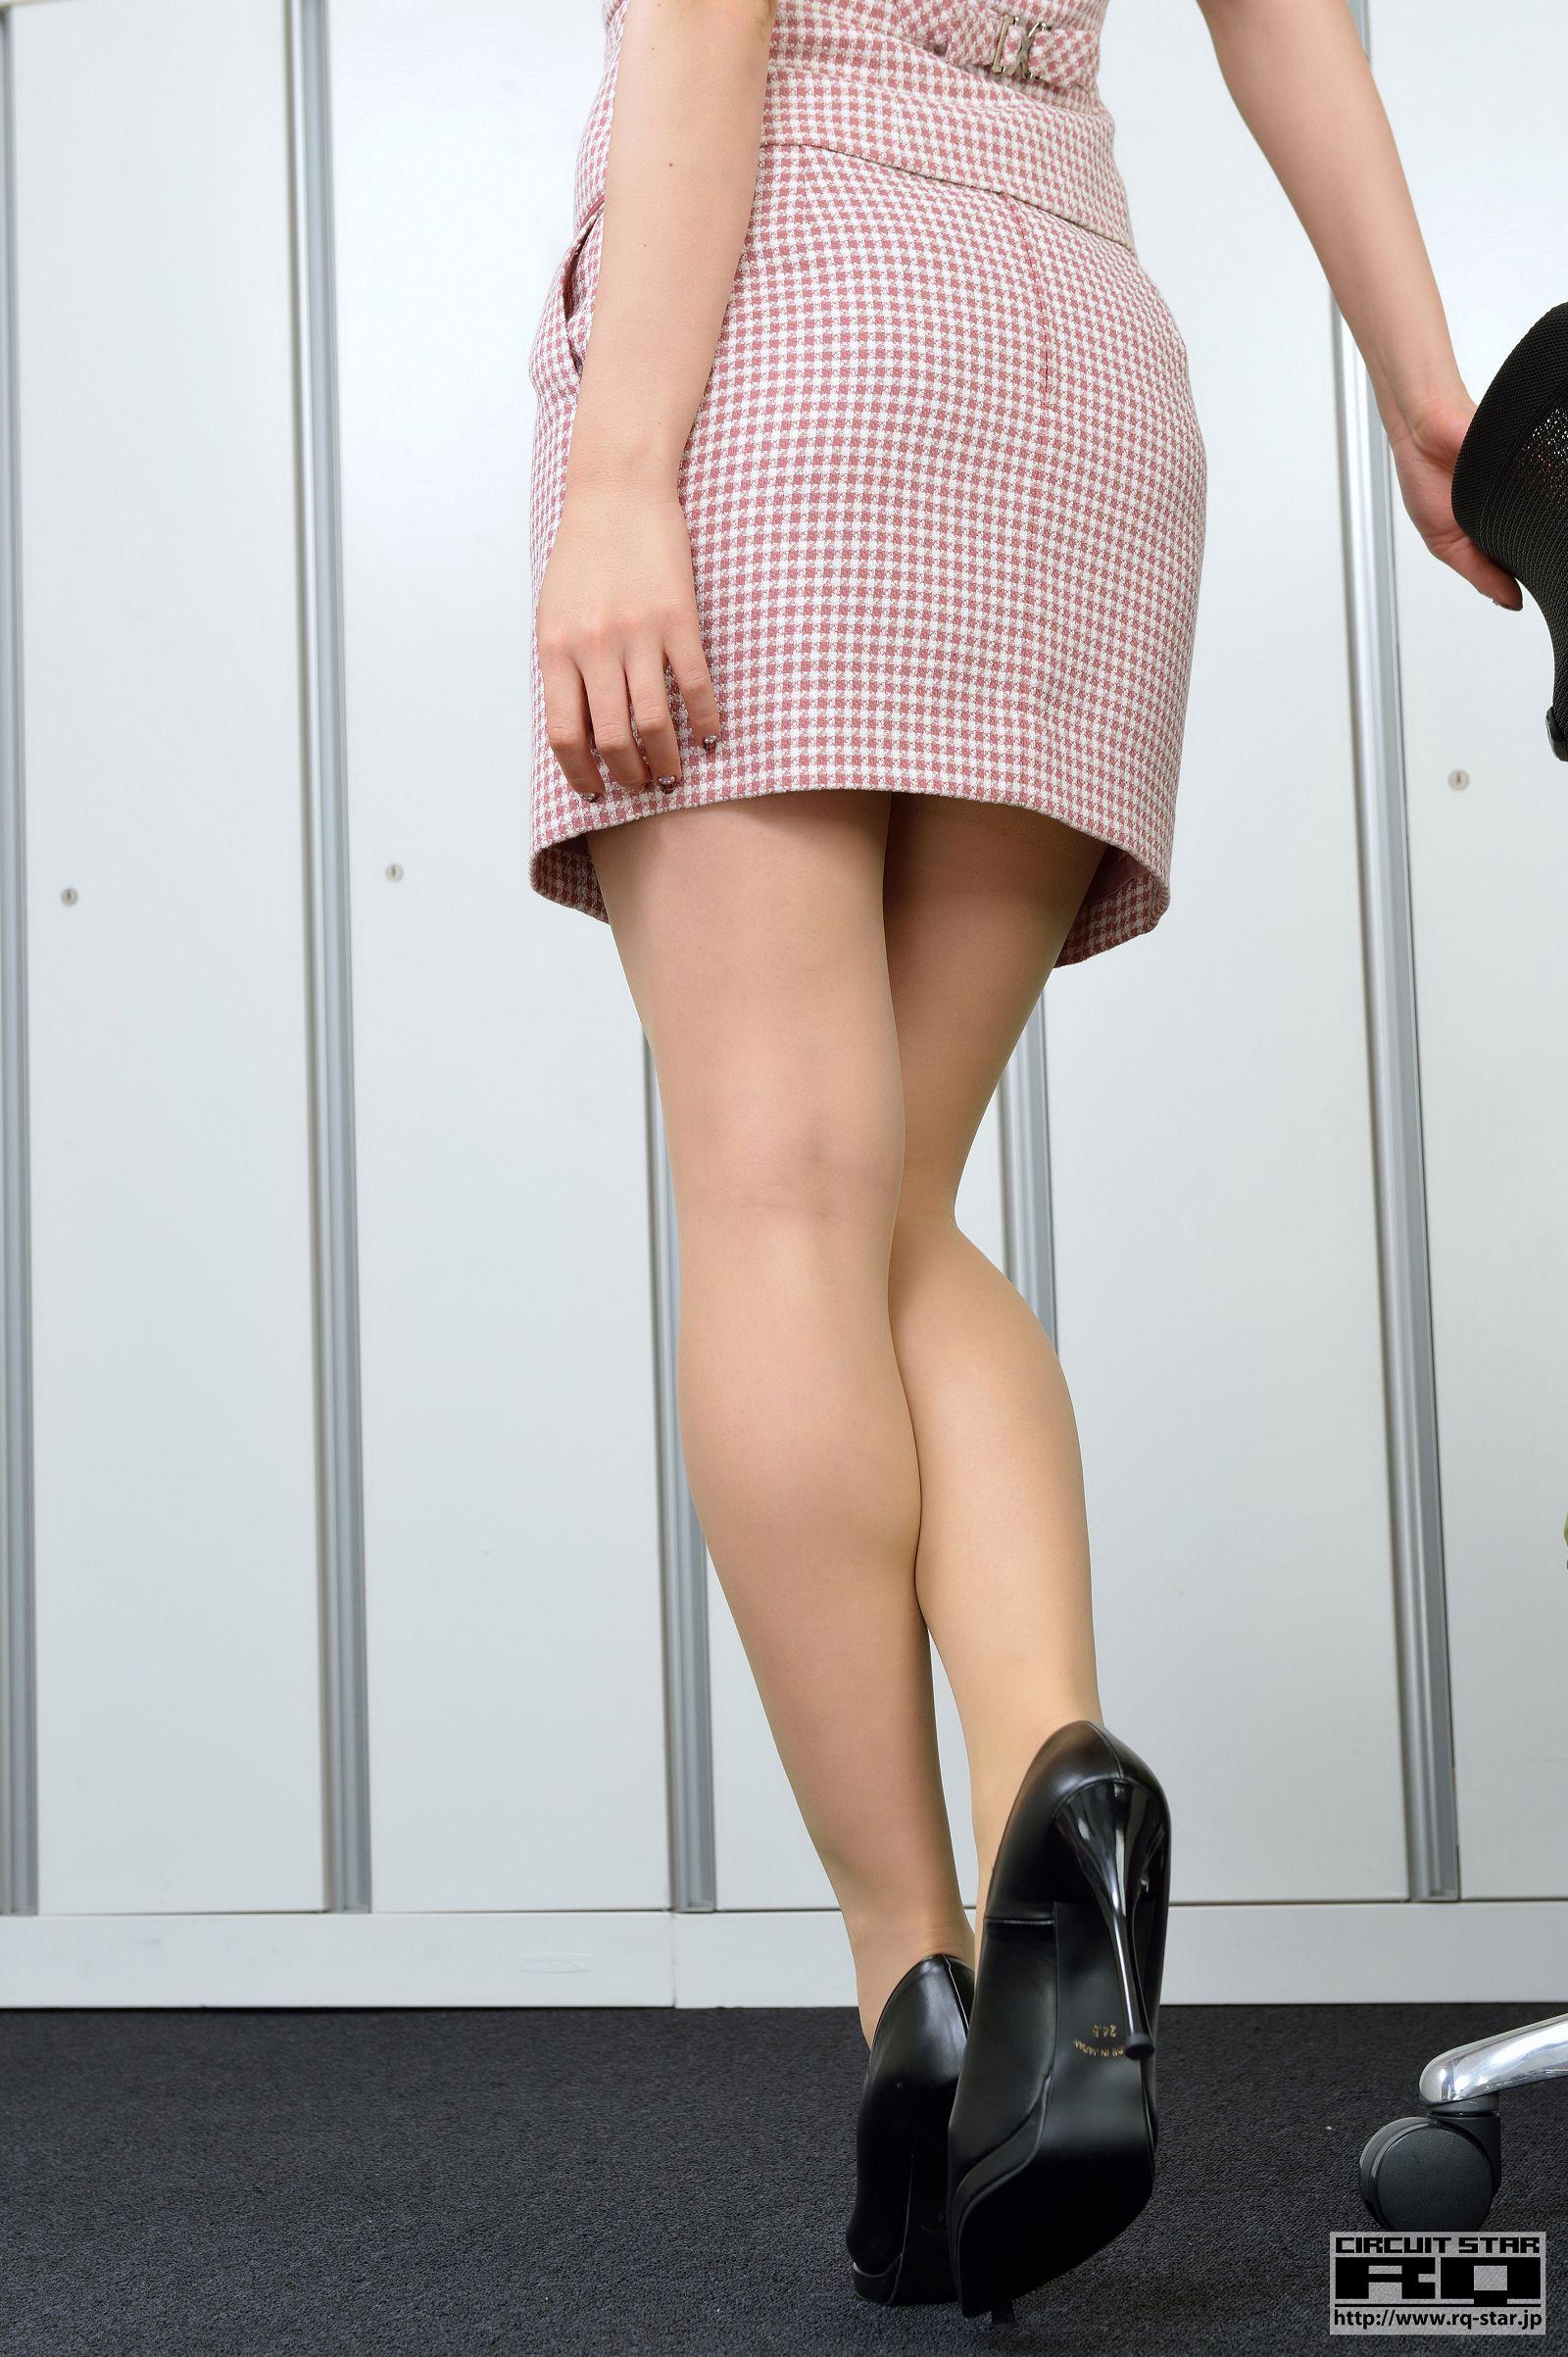 [RQ STAR美女] NO.00899 Miyu Mamiya 間宮美憂 Office Lady[80P] RQ STAR 第3张